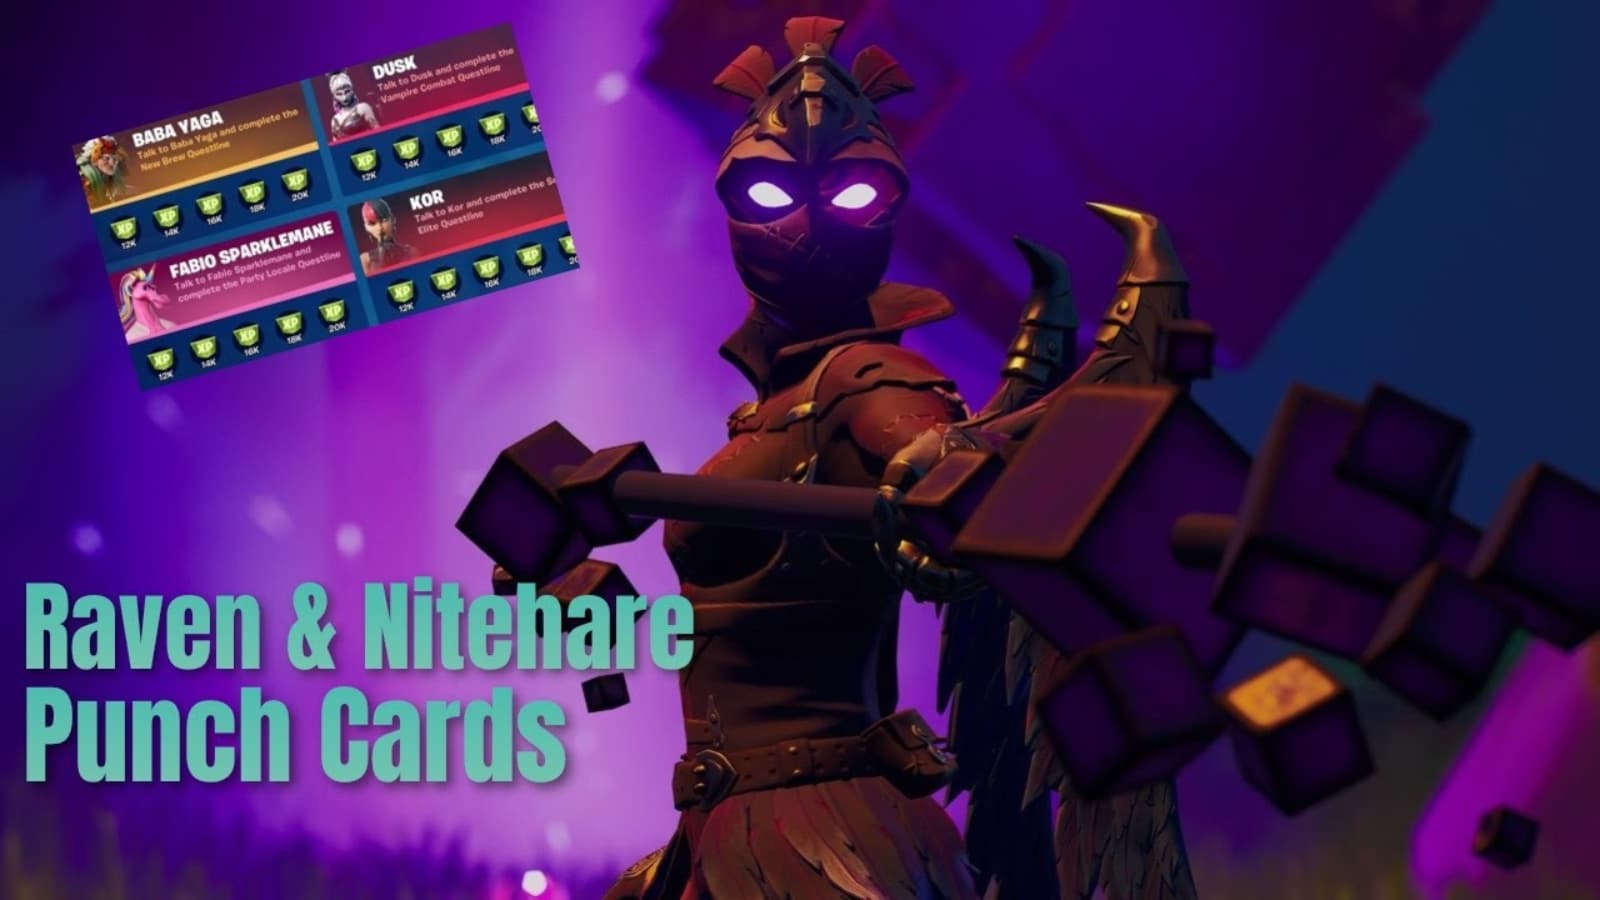 Misiones de tarjetas perforadas de Fortnite Raven: desafíos de Nitehare en la temporada 8